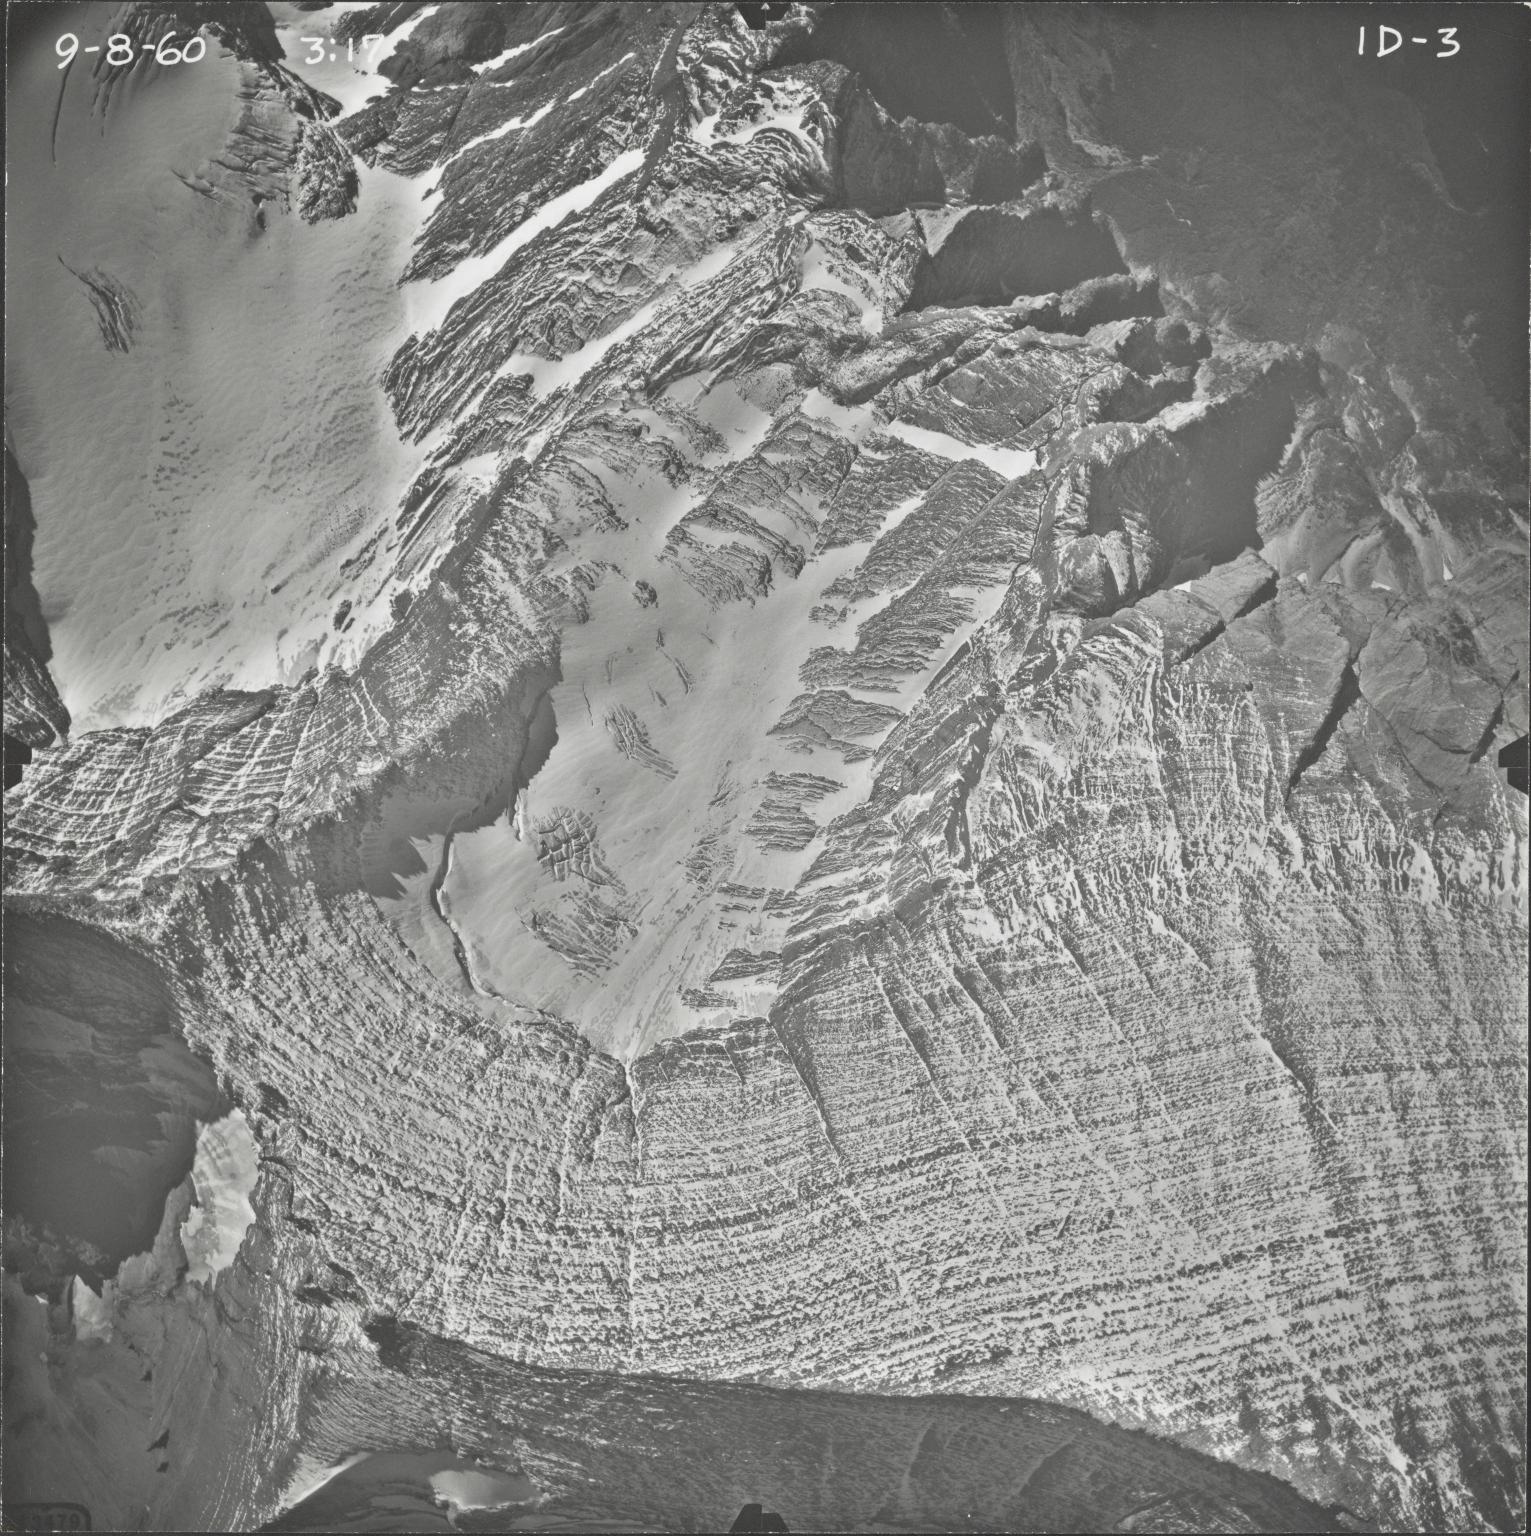 Kintla Glacier, aerial photograph FL ID-3, Montana